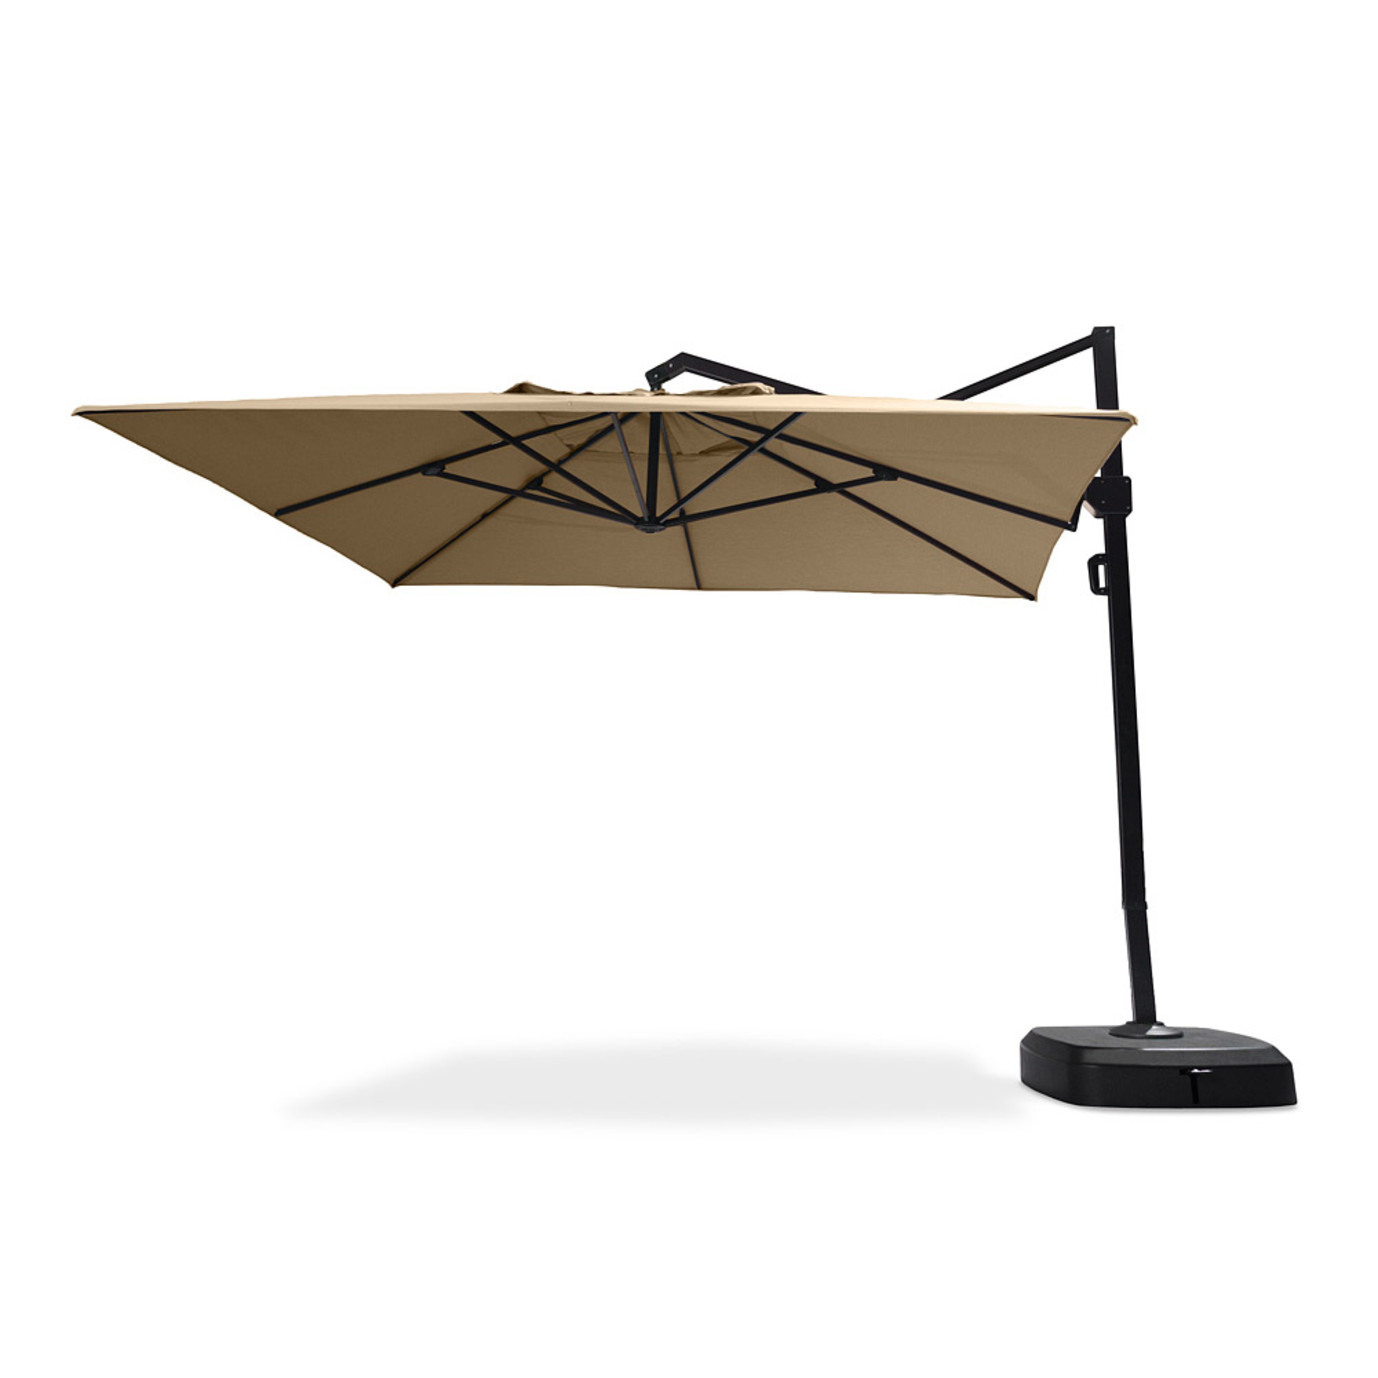 Portofino® Commercial 12ft Umbrella - Heather Beige